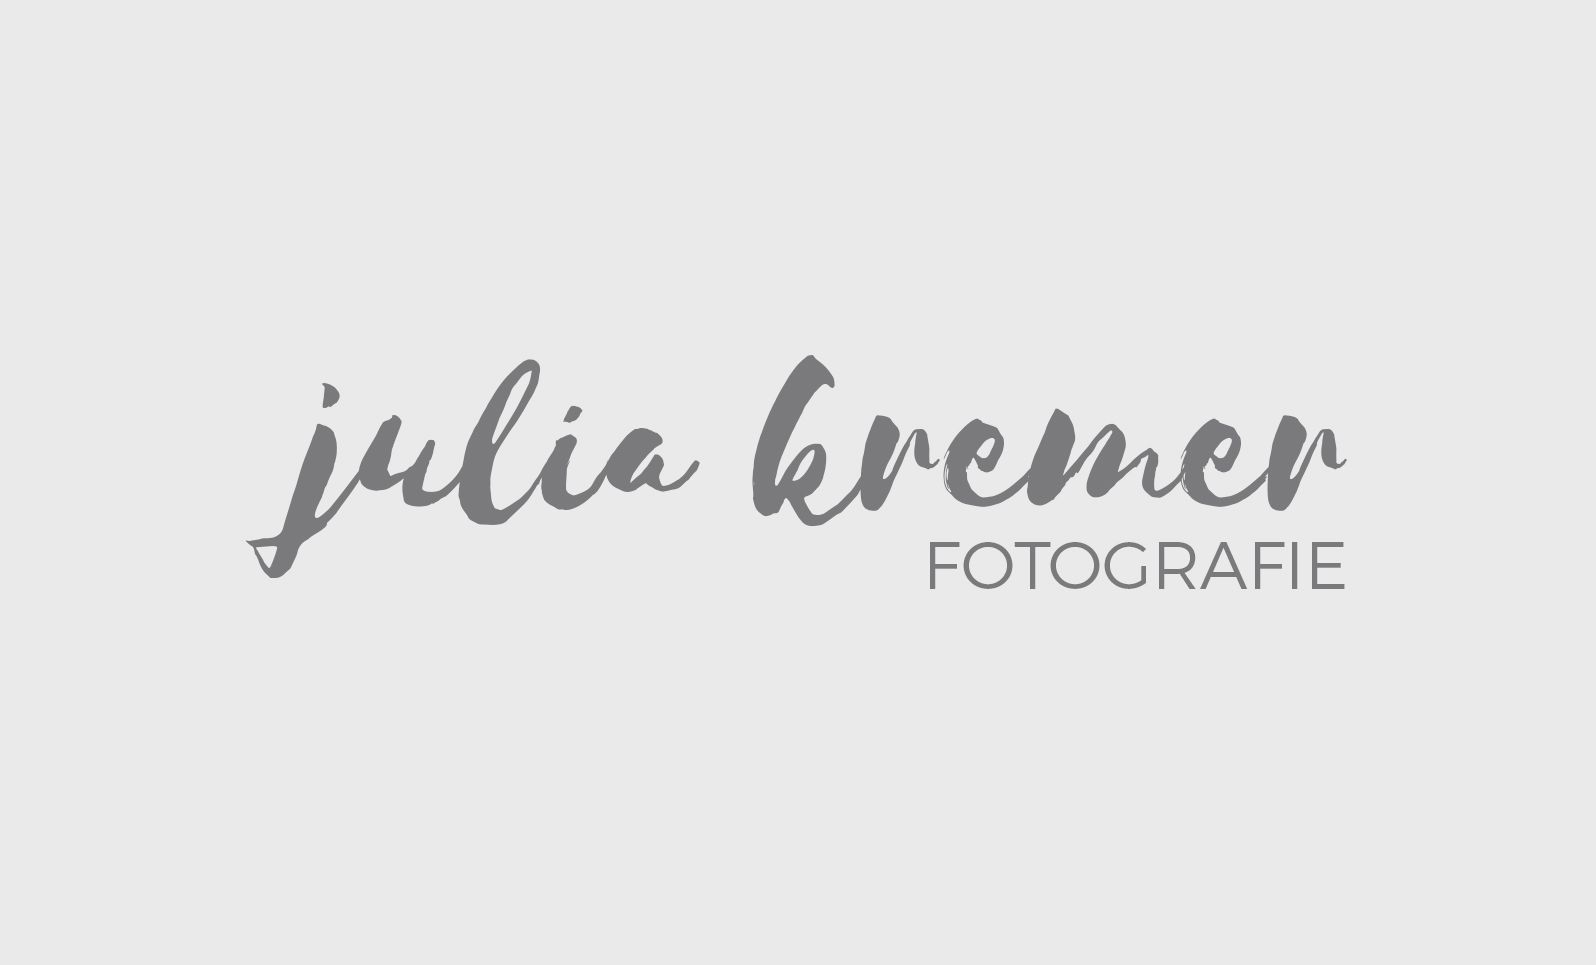 Julia Kremer Fotografie